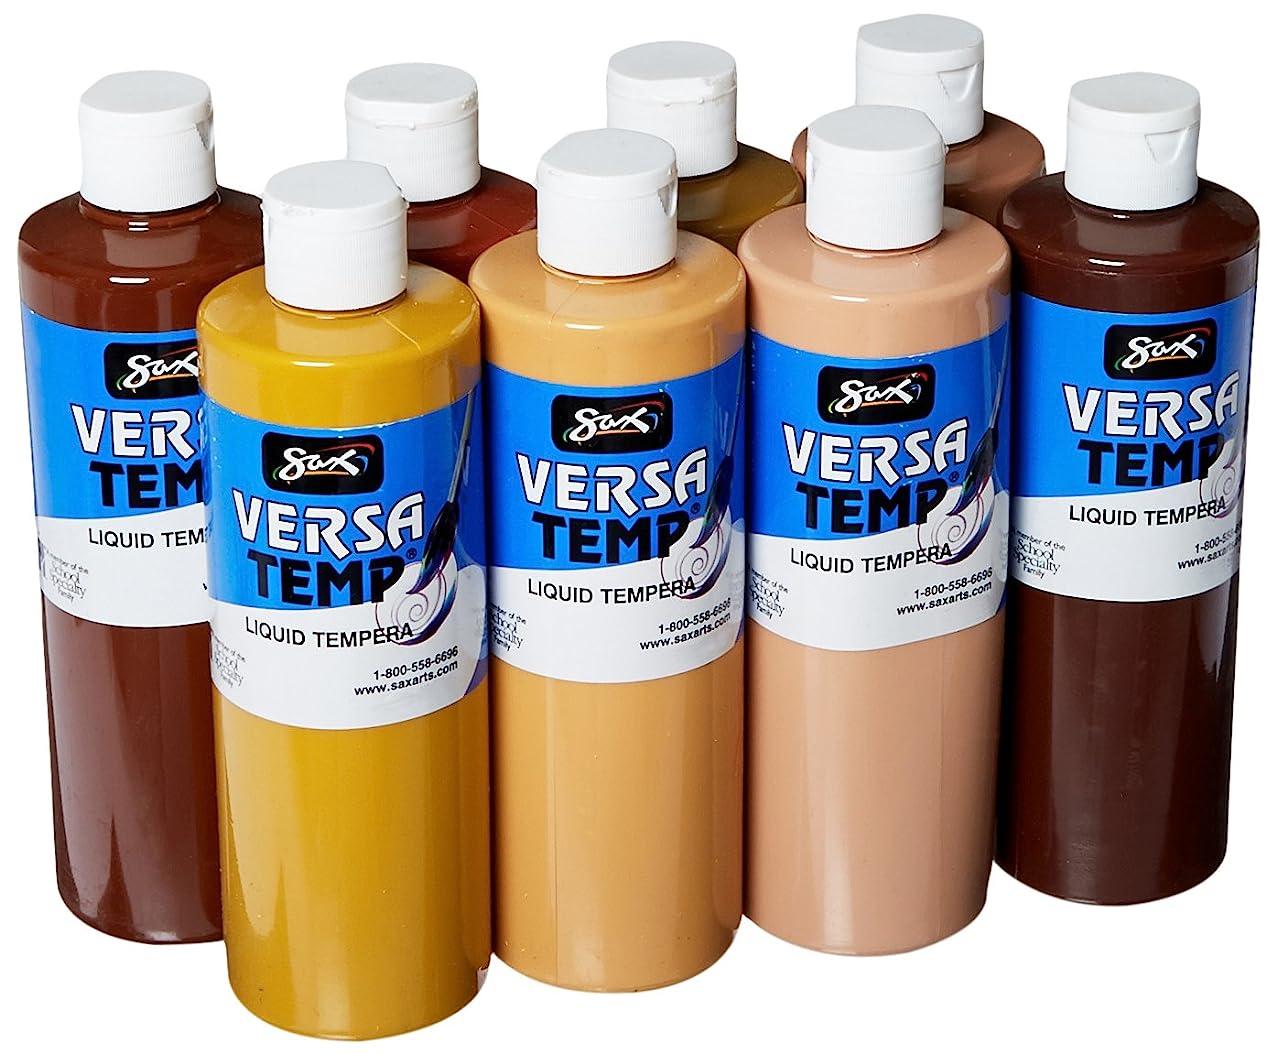 Sax Versatemp Tempera Paint, 1 Pint, Assorted Skin-Tone Colors, Set of 8